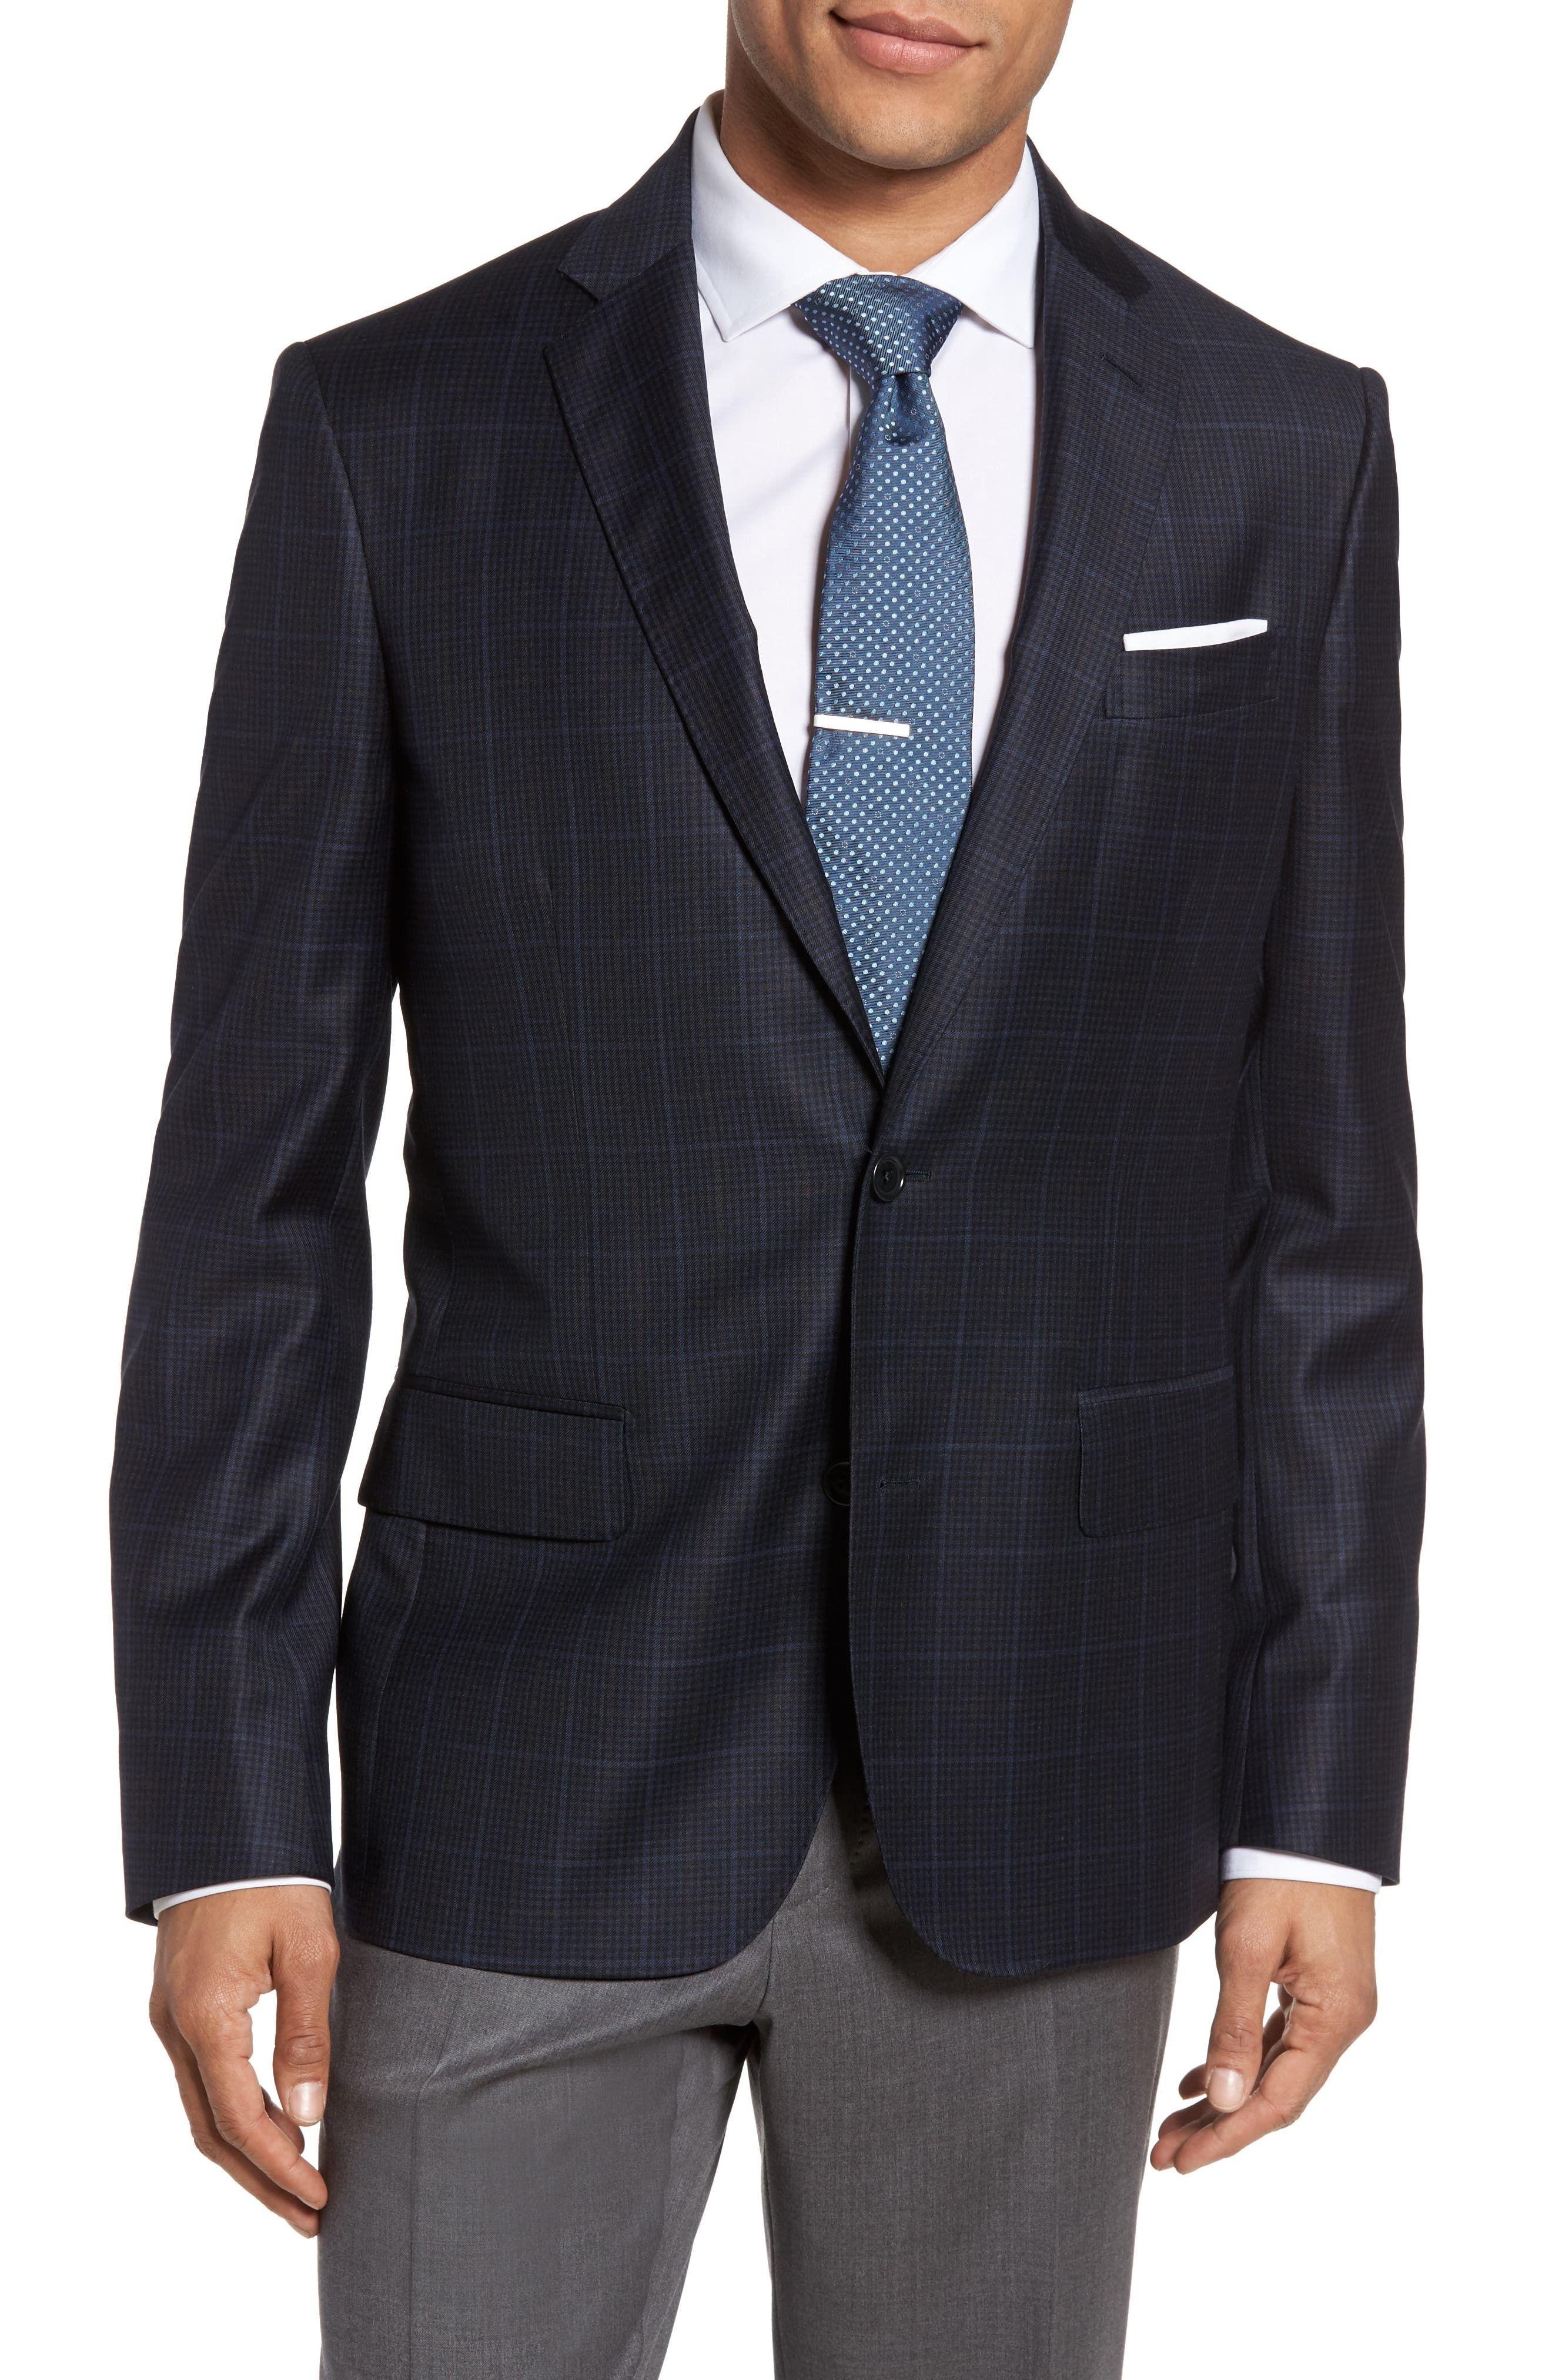 Alternate Image 1 Selected - Nordstrom Men's Shop Classic Fit Plaid Wool Sport Coat